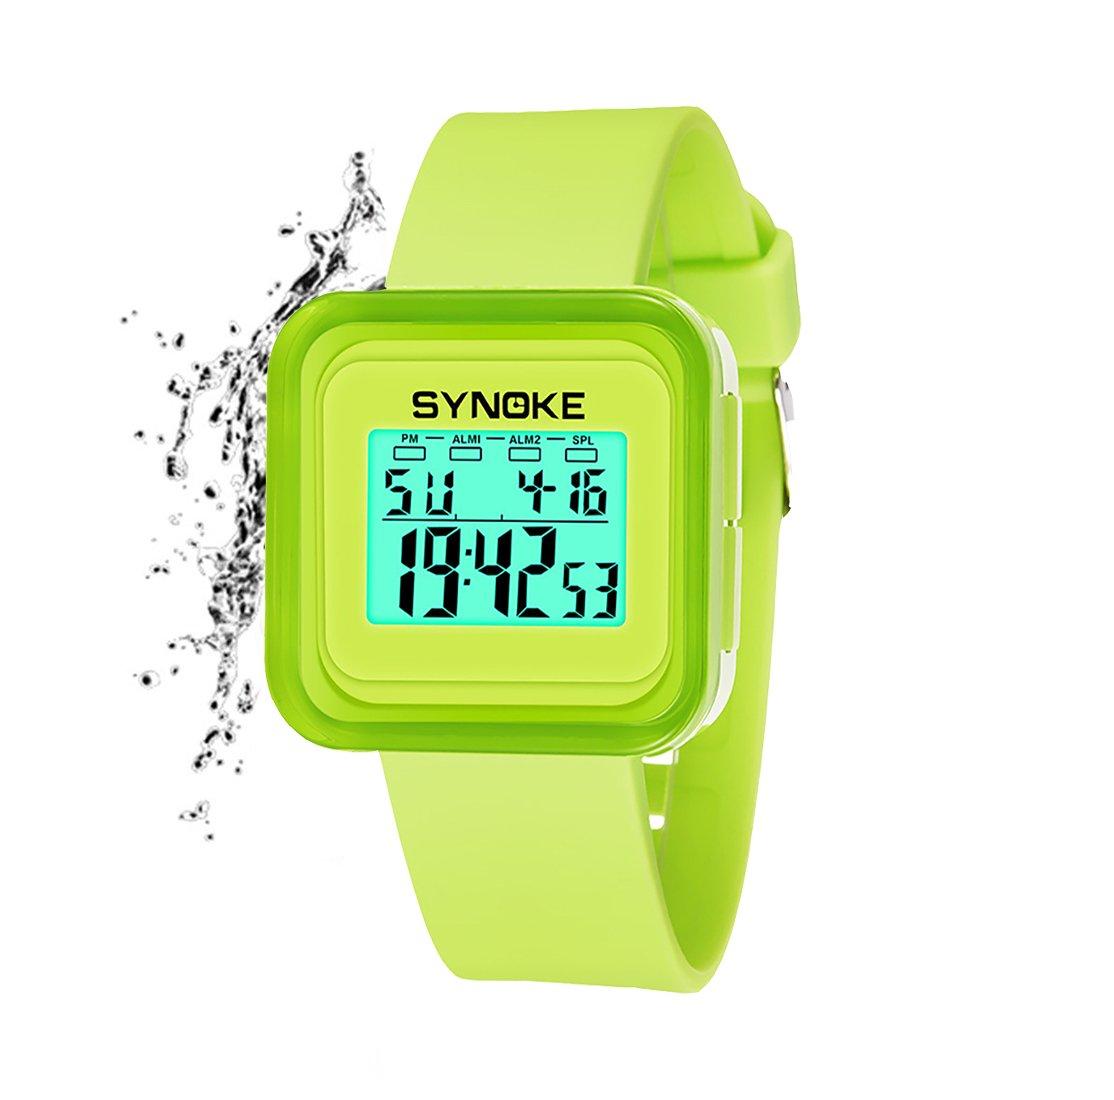 Kids Boys Girls Sport Digital Watch,Outdoor 50M Waterproof Watch with Alarm Stopwatch Square Wrist Watches for Girls Boys (Green)